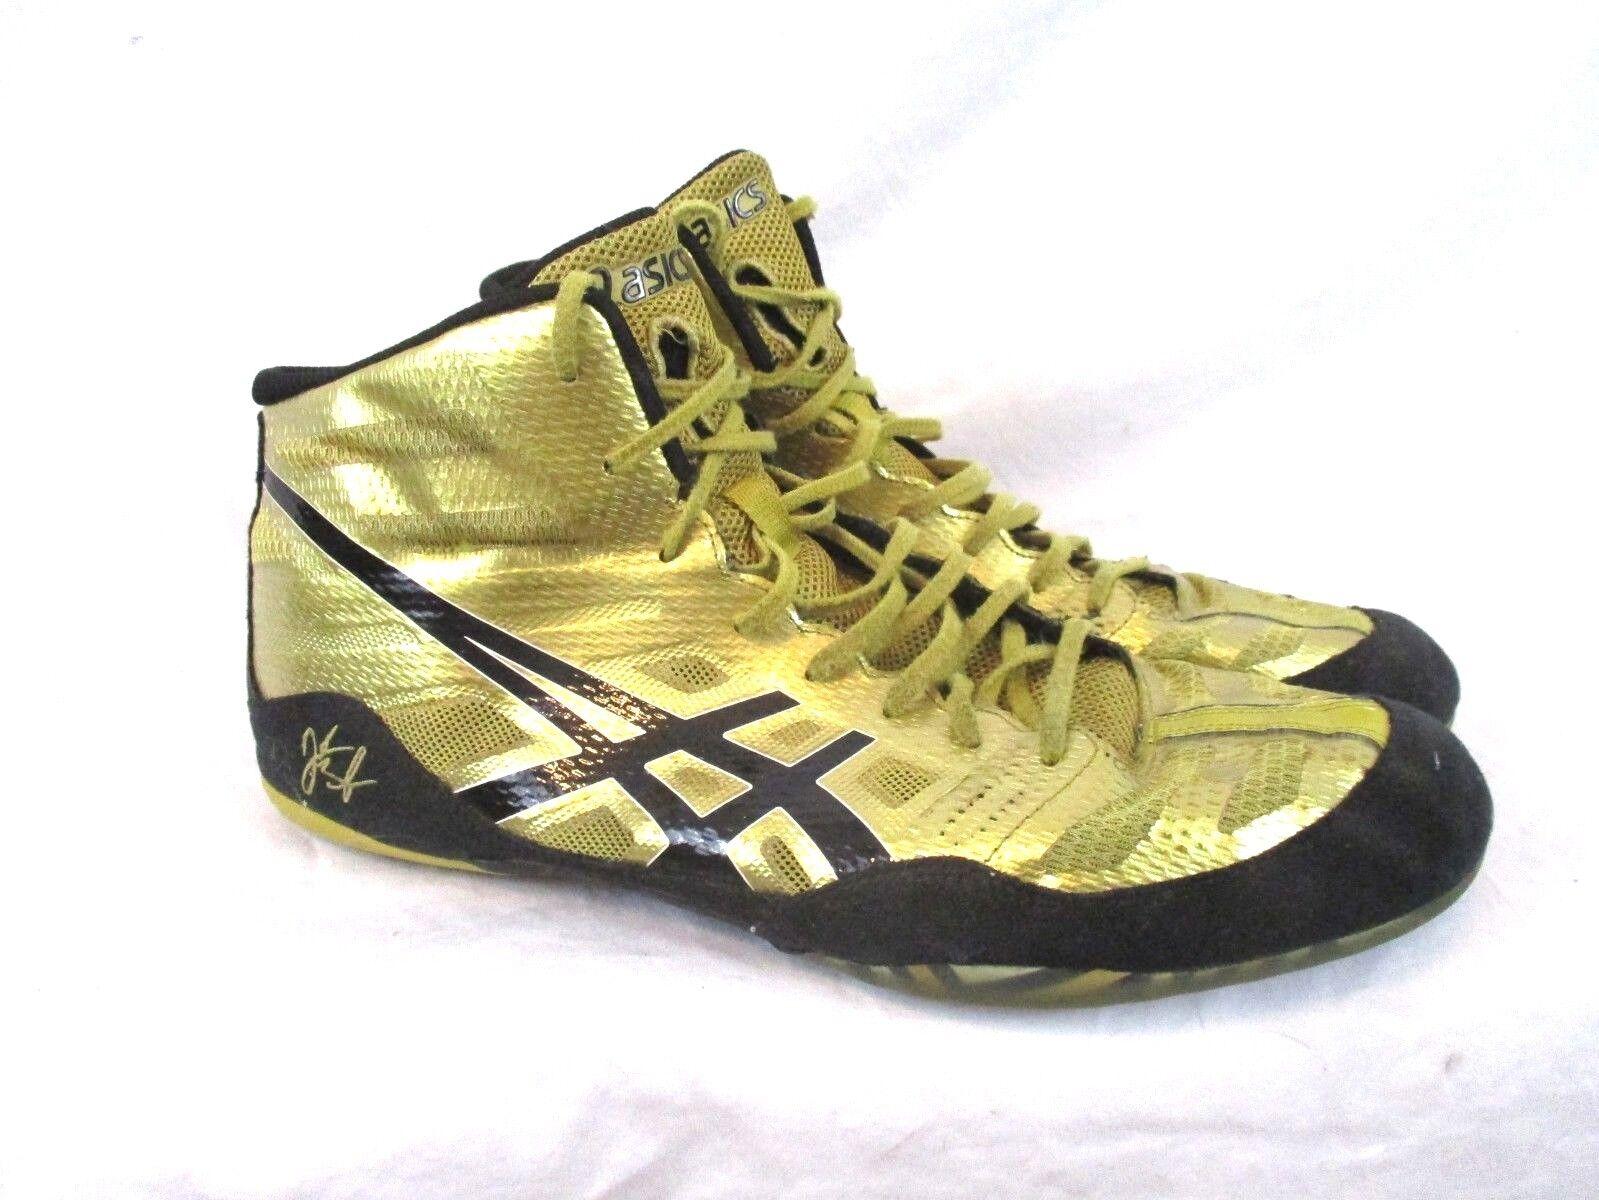 ASICS Homme JB Elite Wresting Chaussures Olympic Doré Metallic Noir Sz 13 J3A1Y SS4